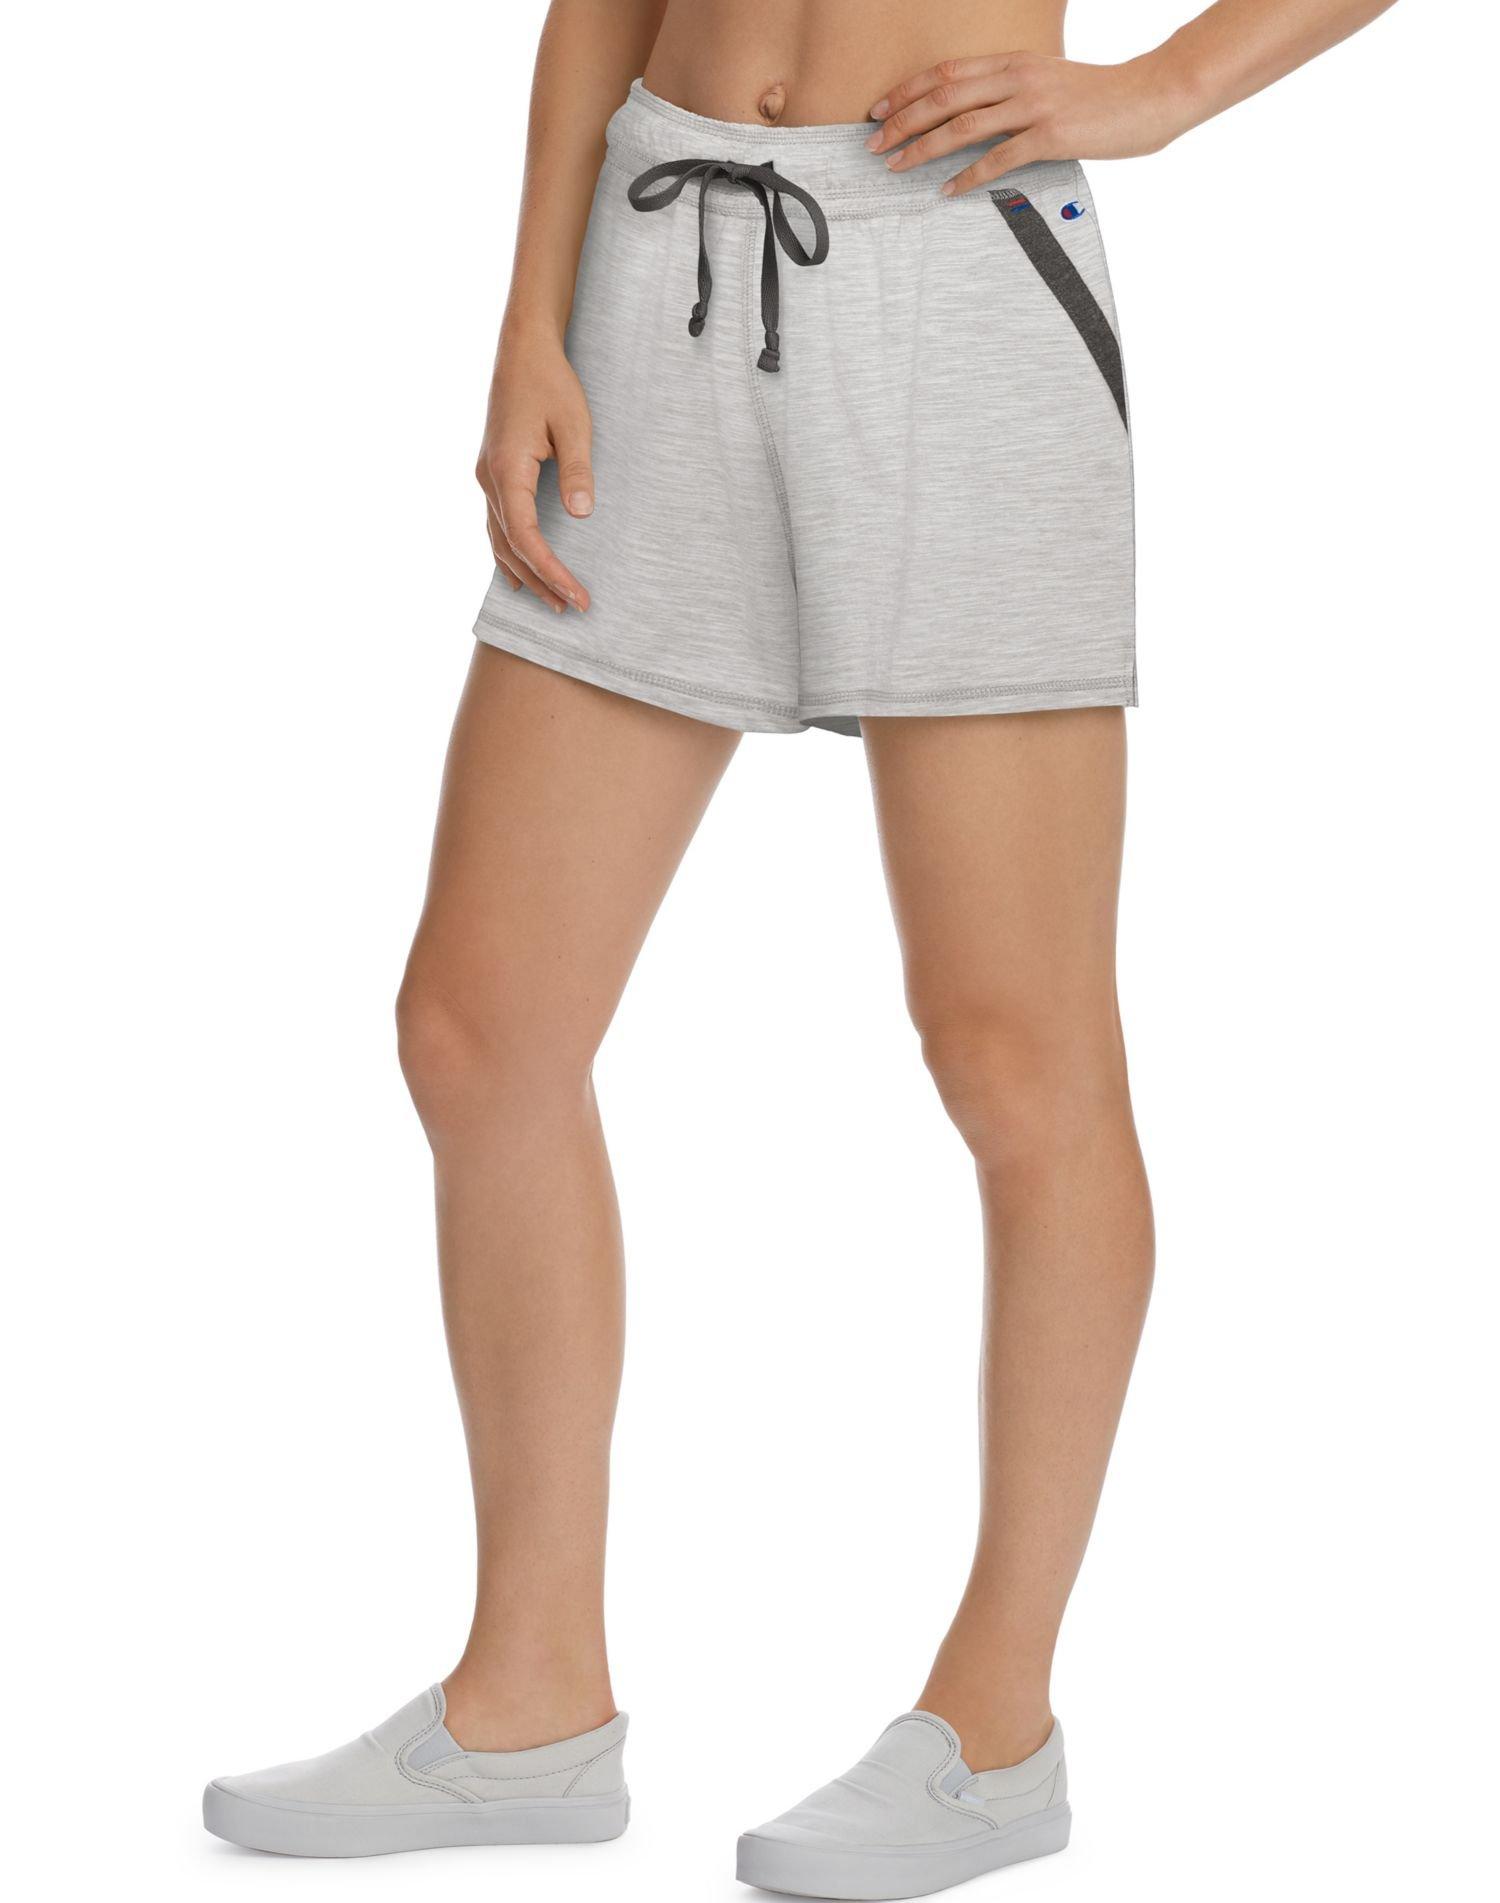 Champion Women's Jersey Short, Oxford Gray Granite Heather, X-Small